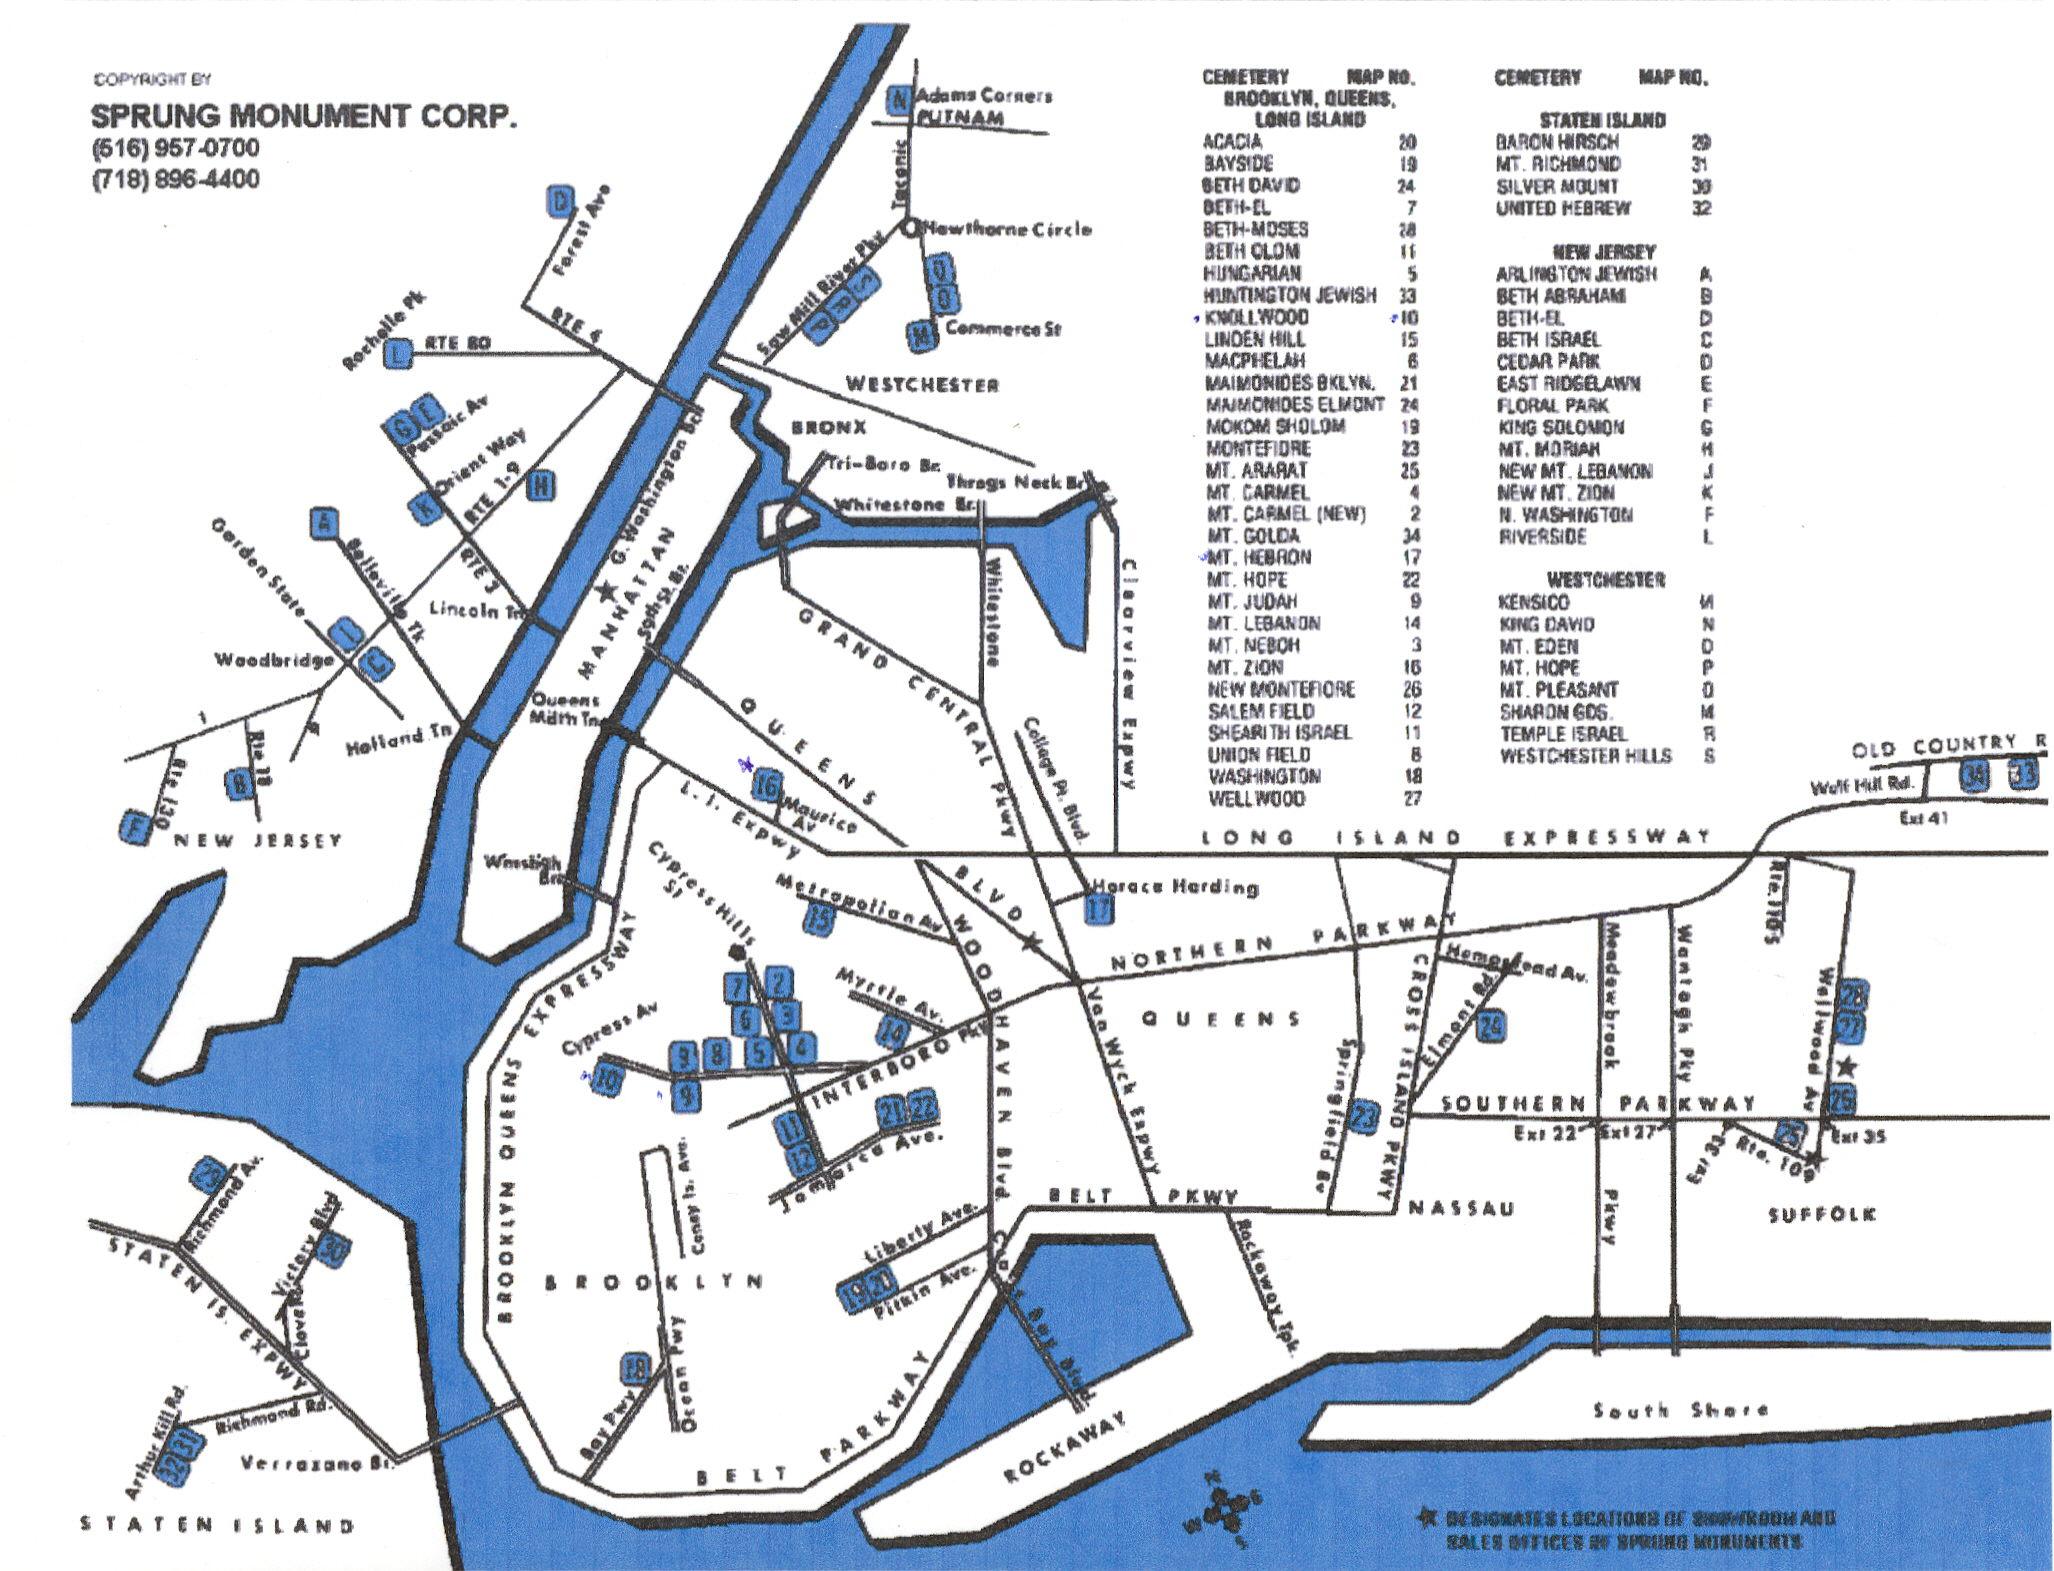 Cp/maps/ny-Nj - Florida National Cemetery Map